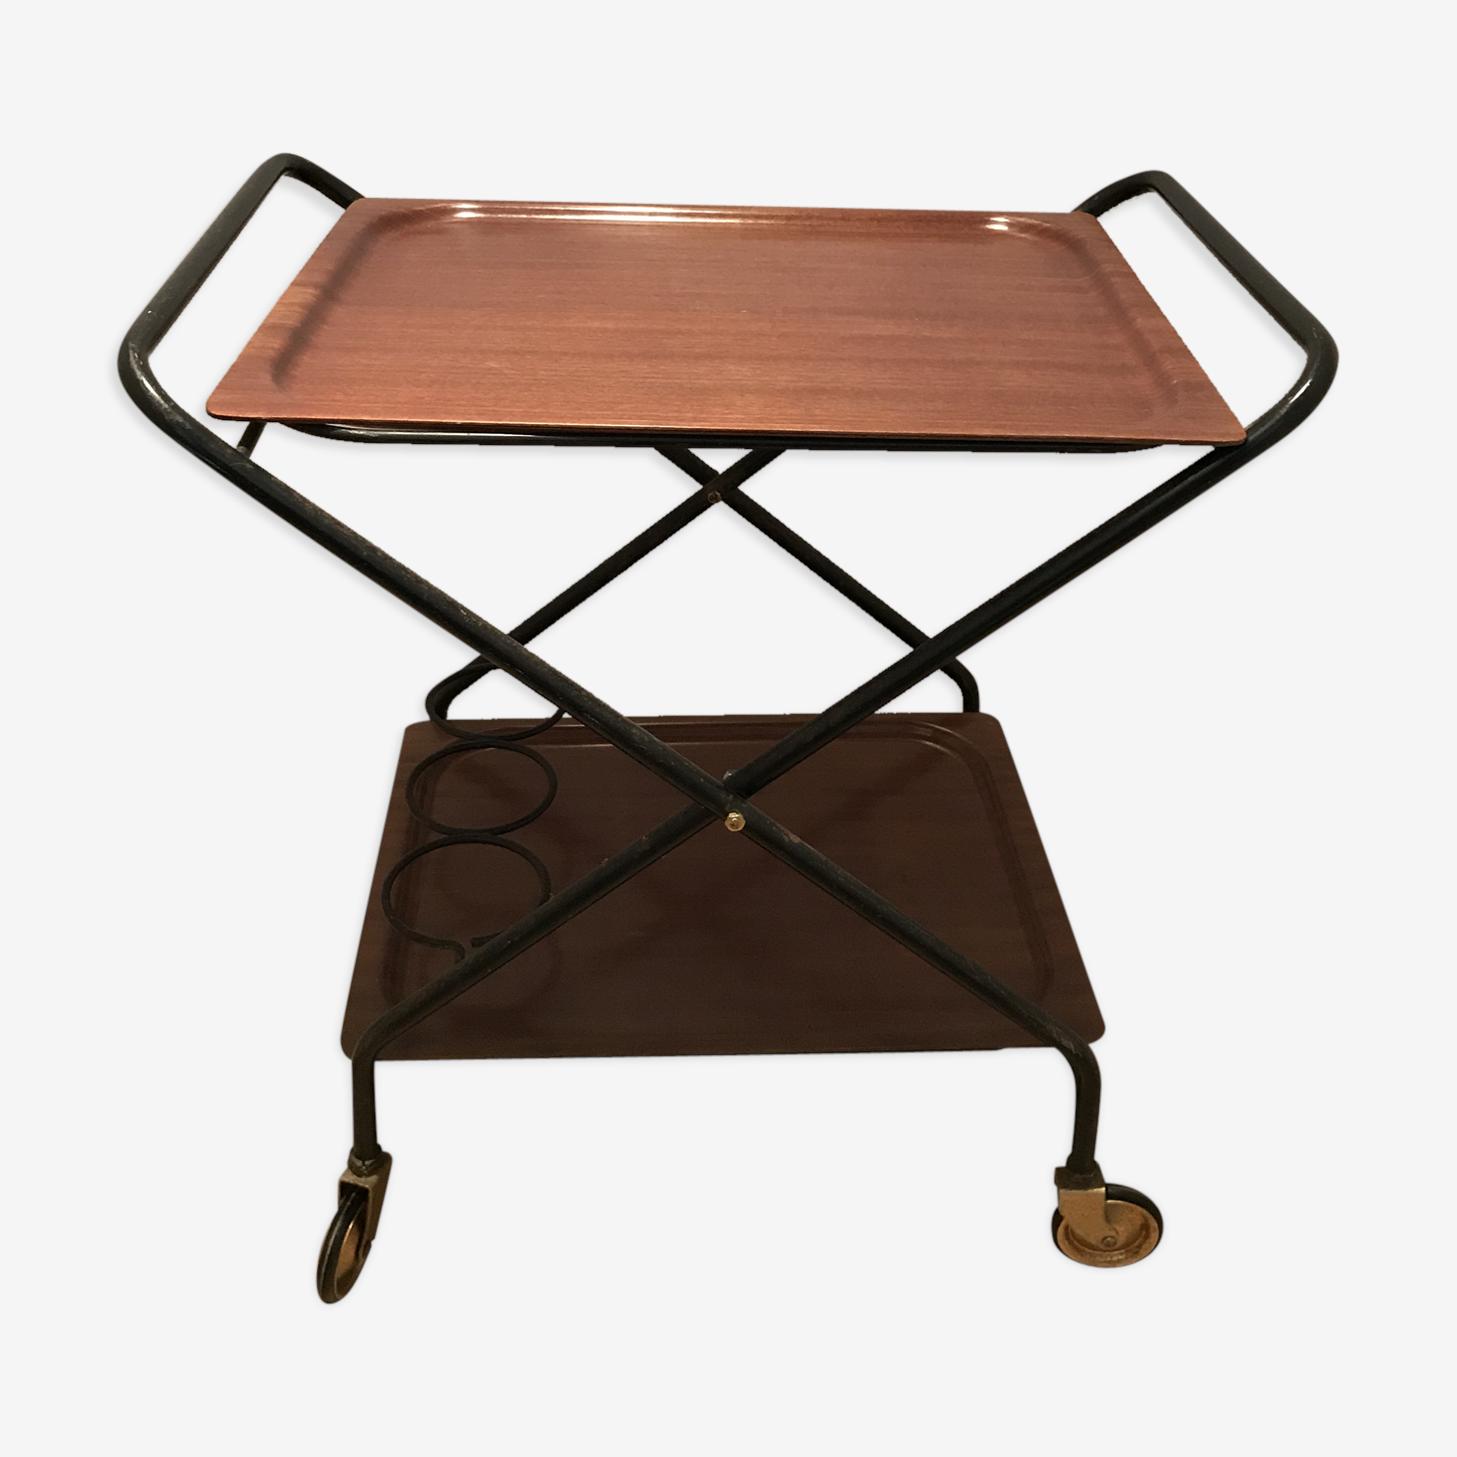 Folding serving table